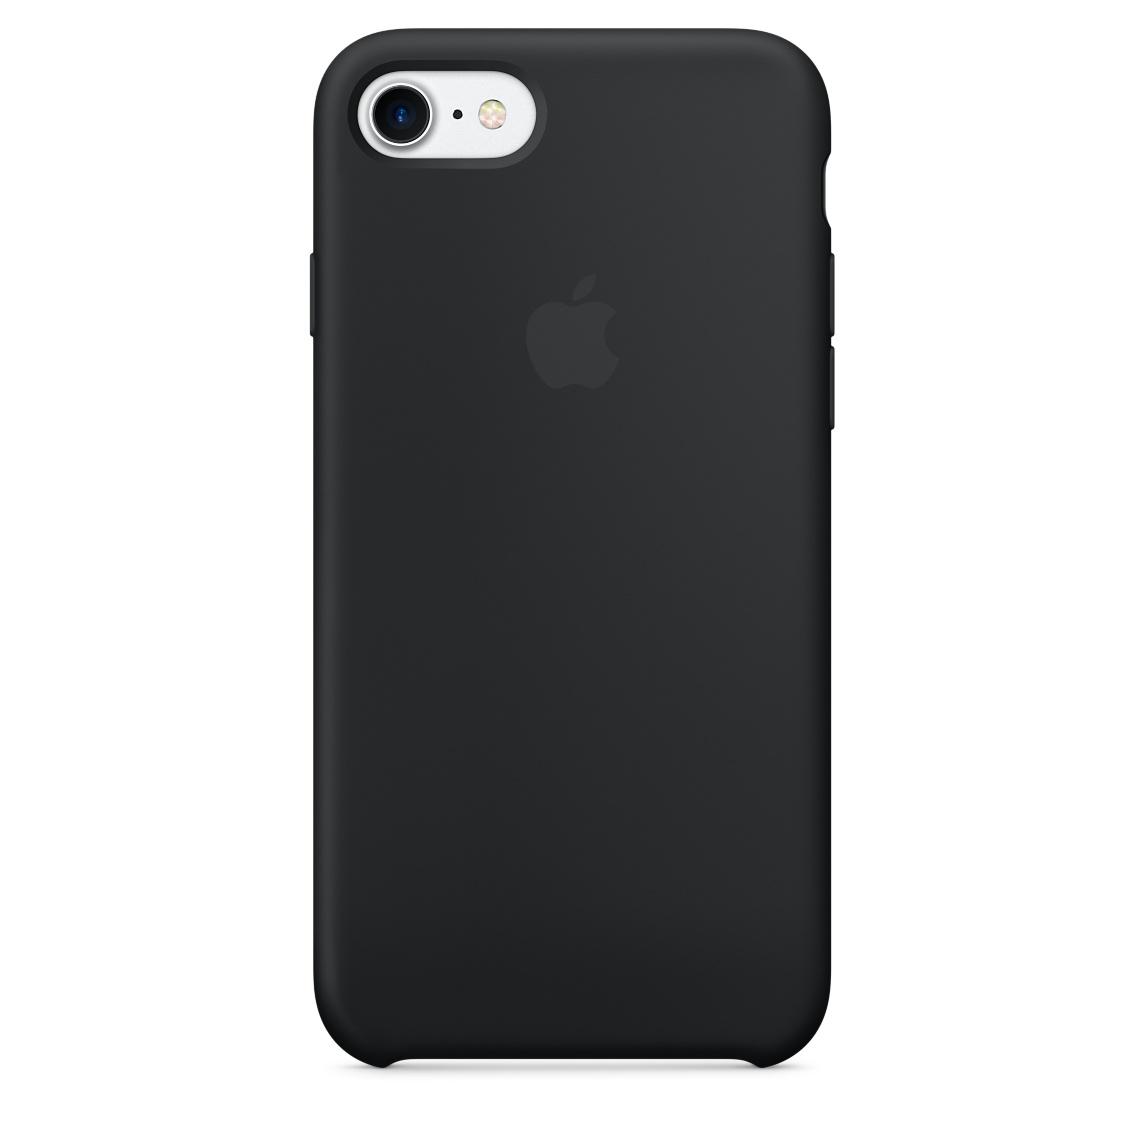 Ochranný kryt pro iPhone 7 / 8 - Apple, Silicone Case Black